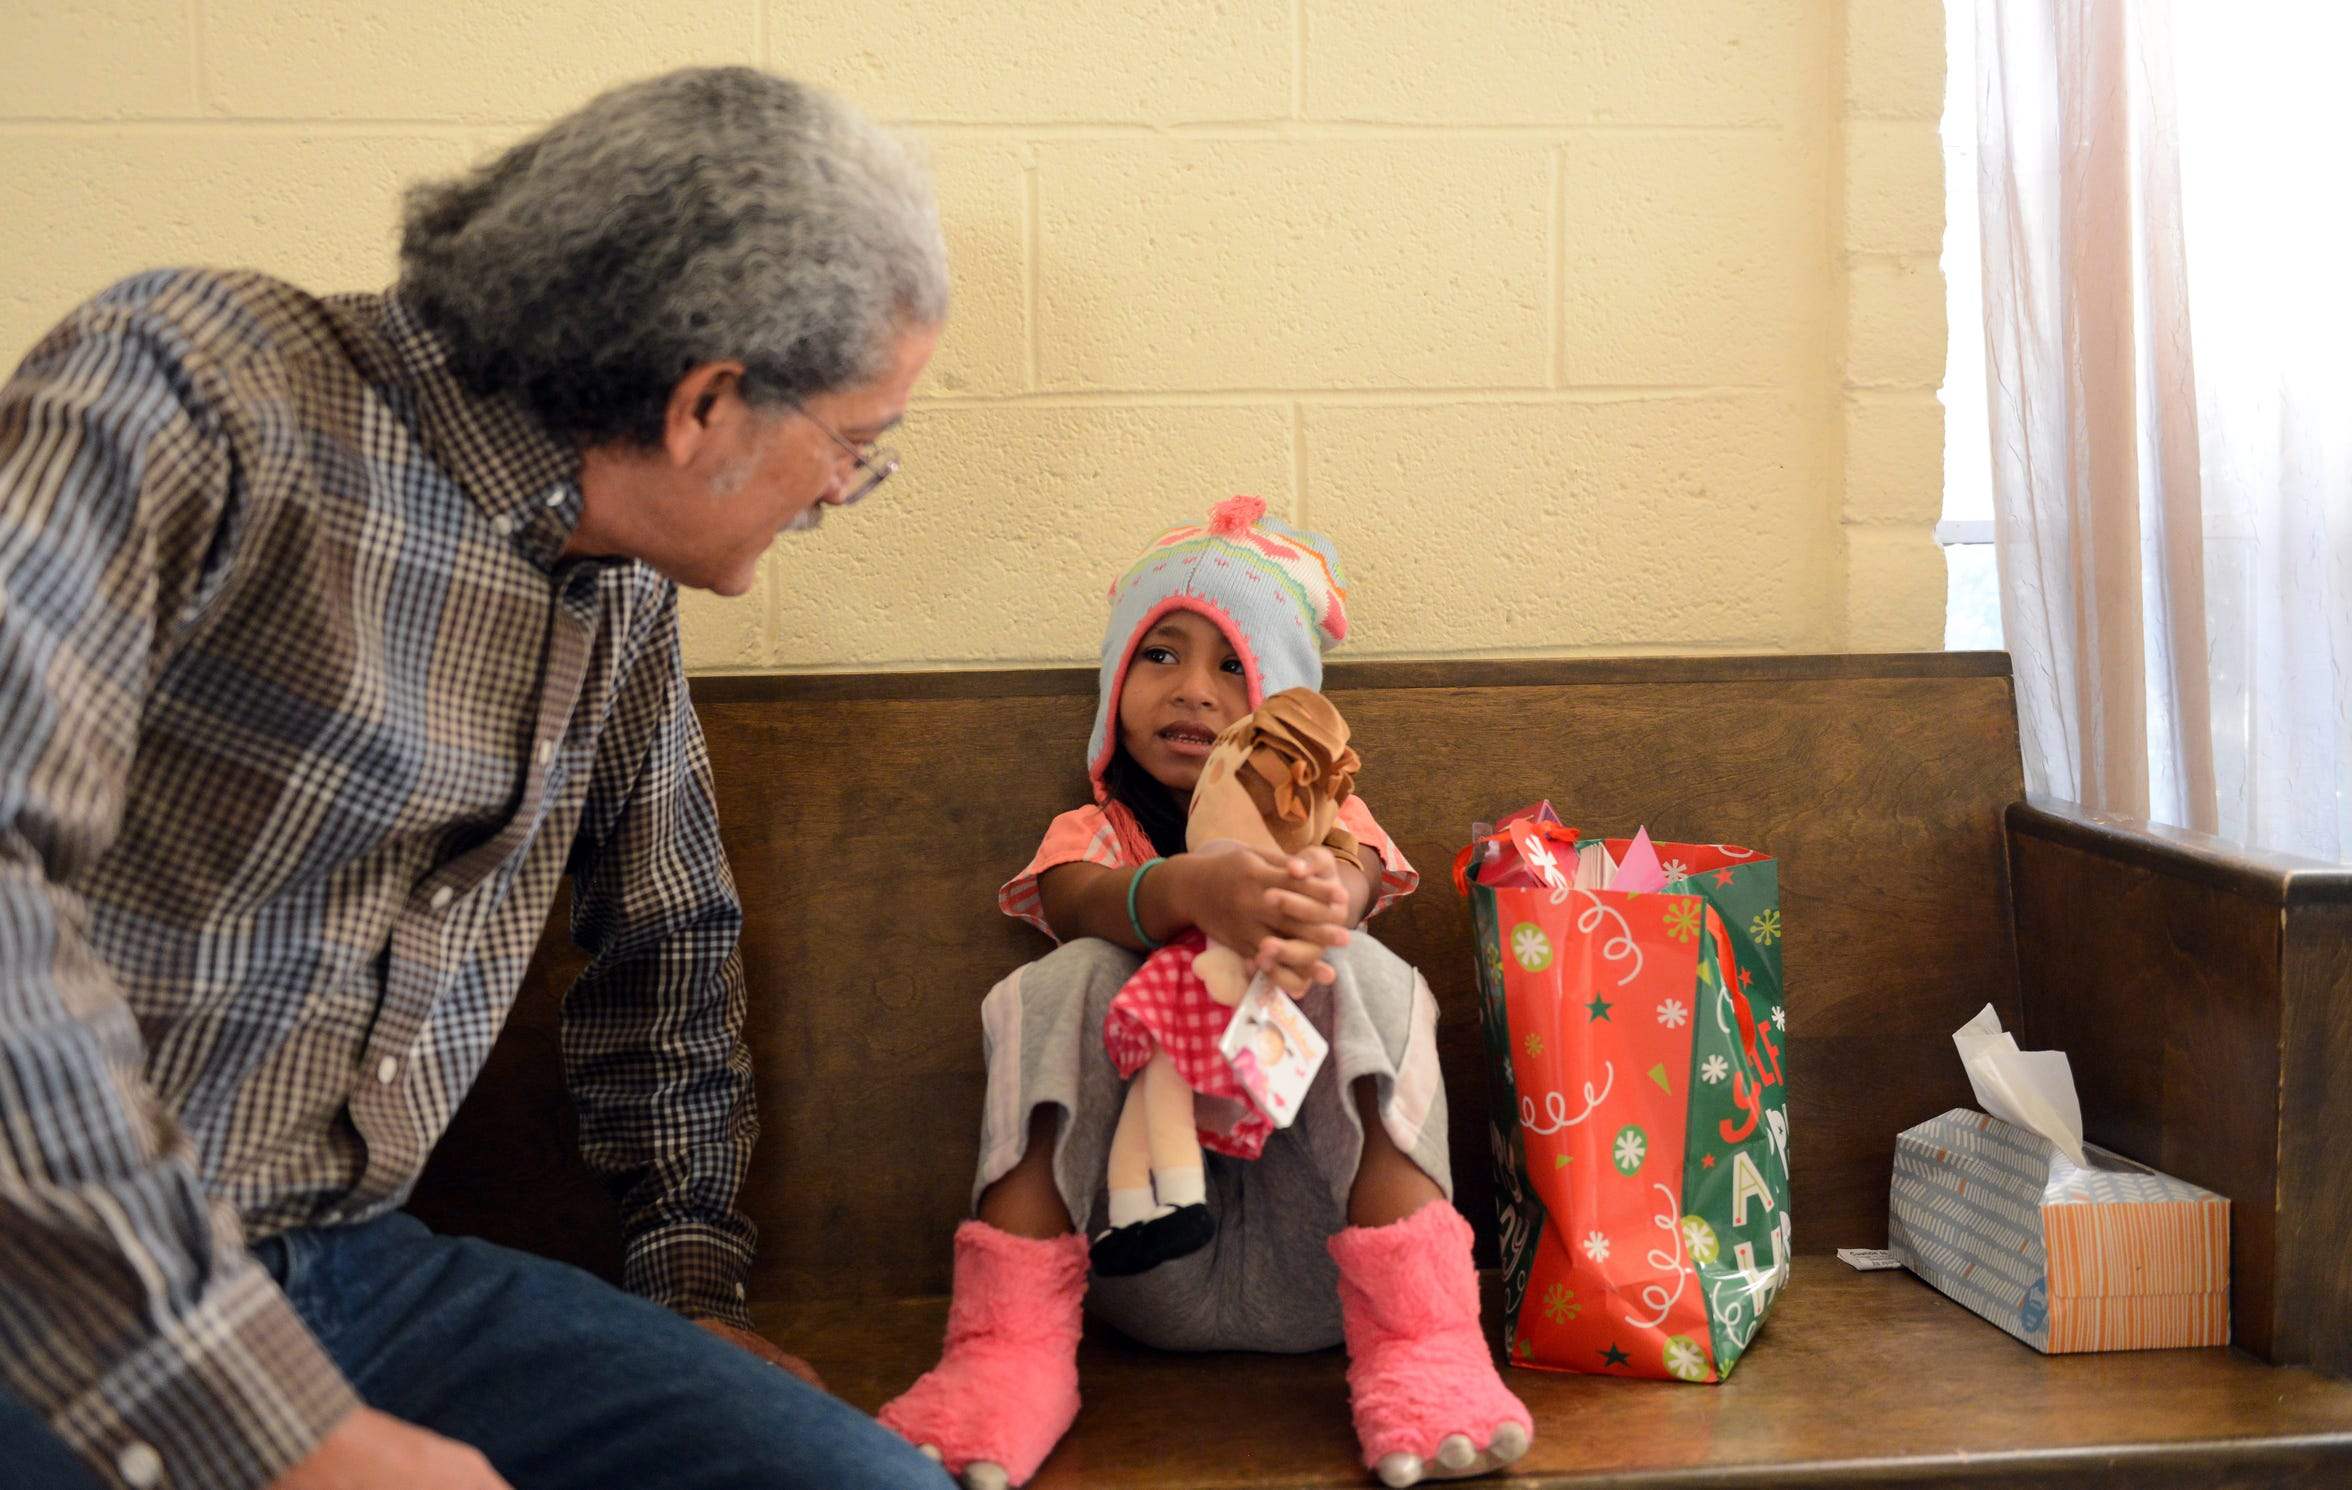 Anselmo Delgado-Martinez speaks to a 4-year-old Guatemalan girl in December 2018 at El Calvario Methodist church in Las Cruces.